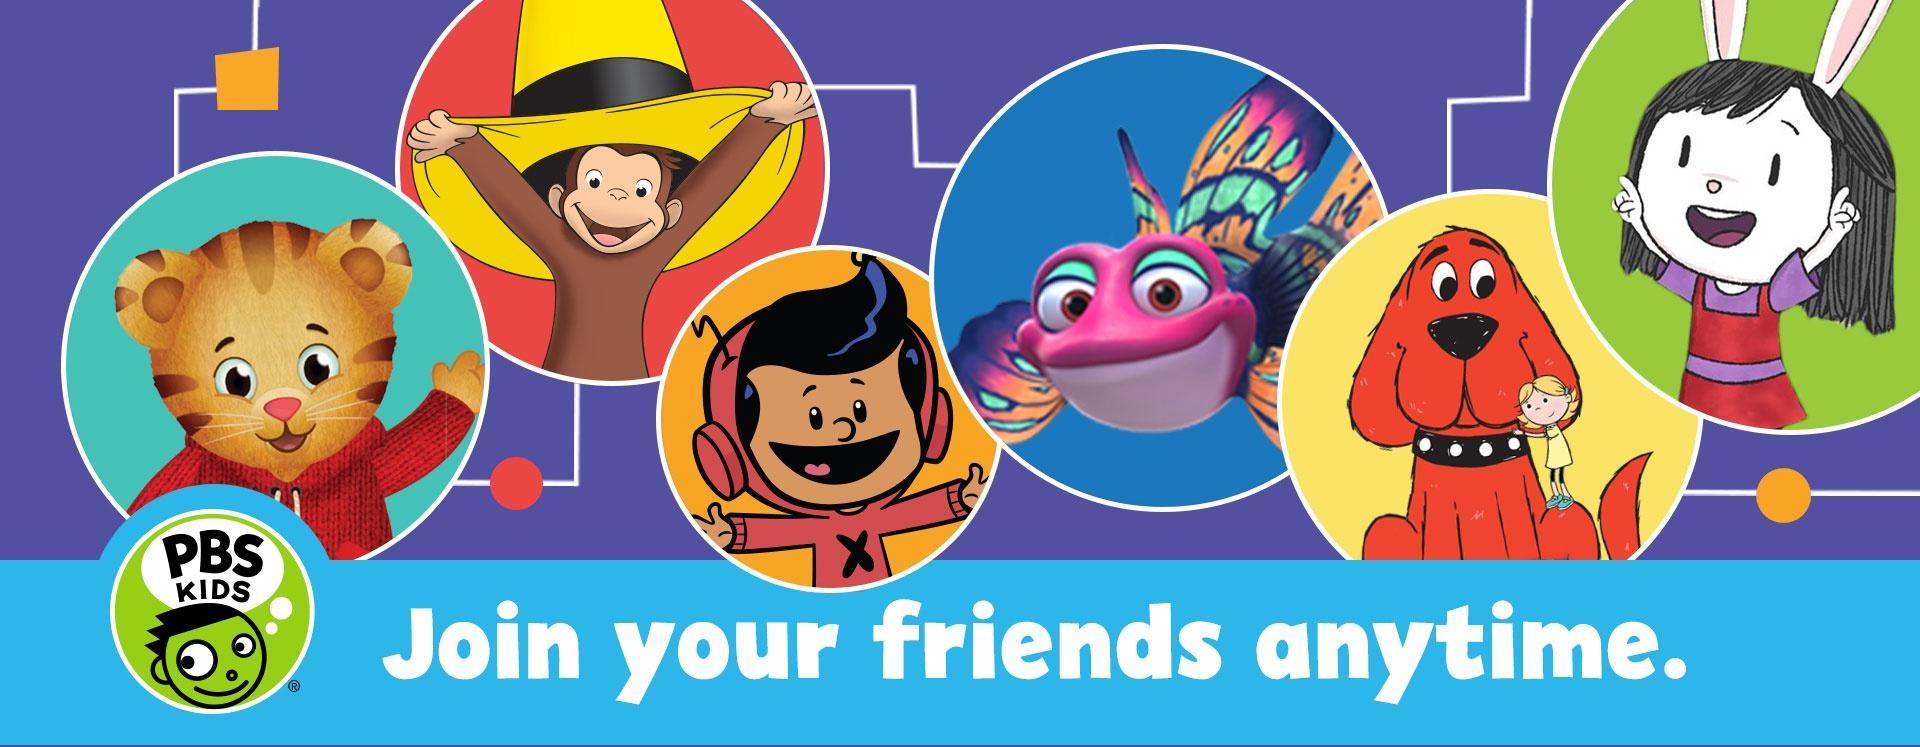 Watch Nine PBS KIDS